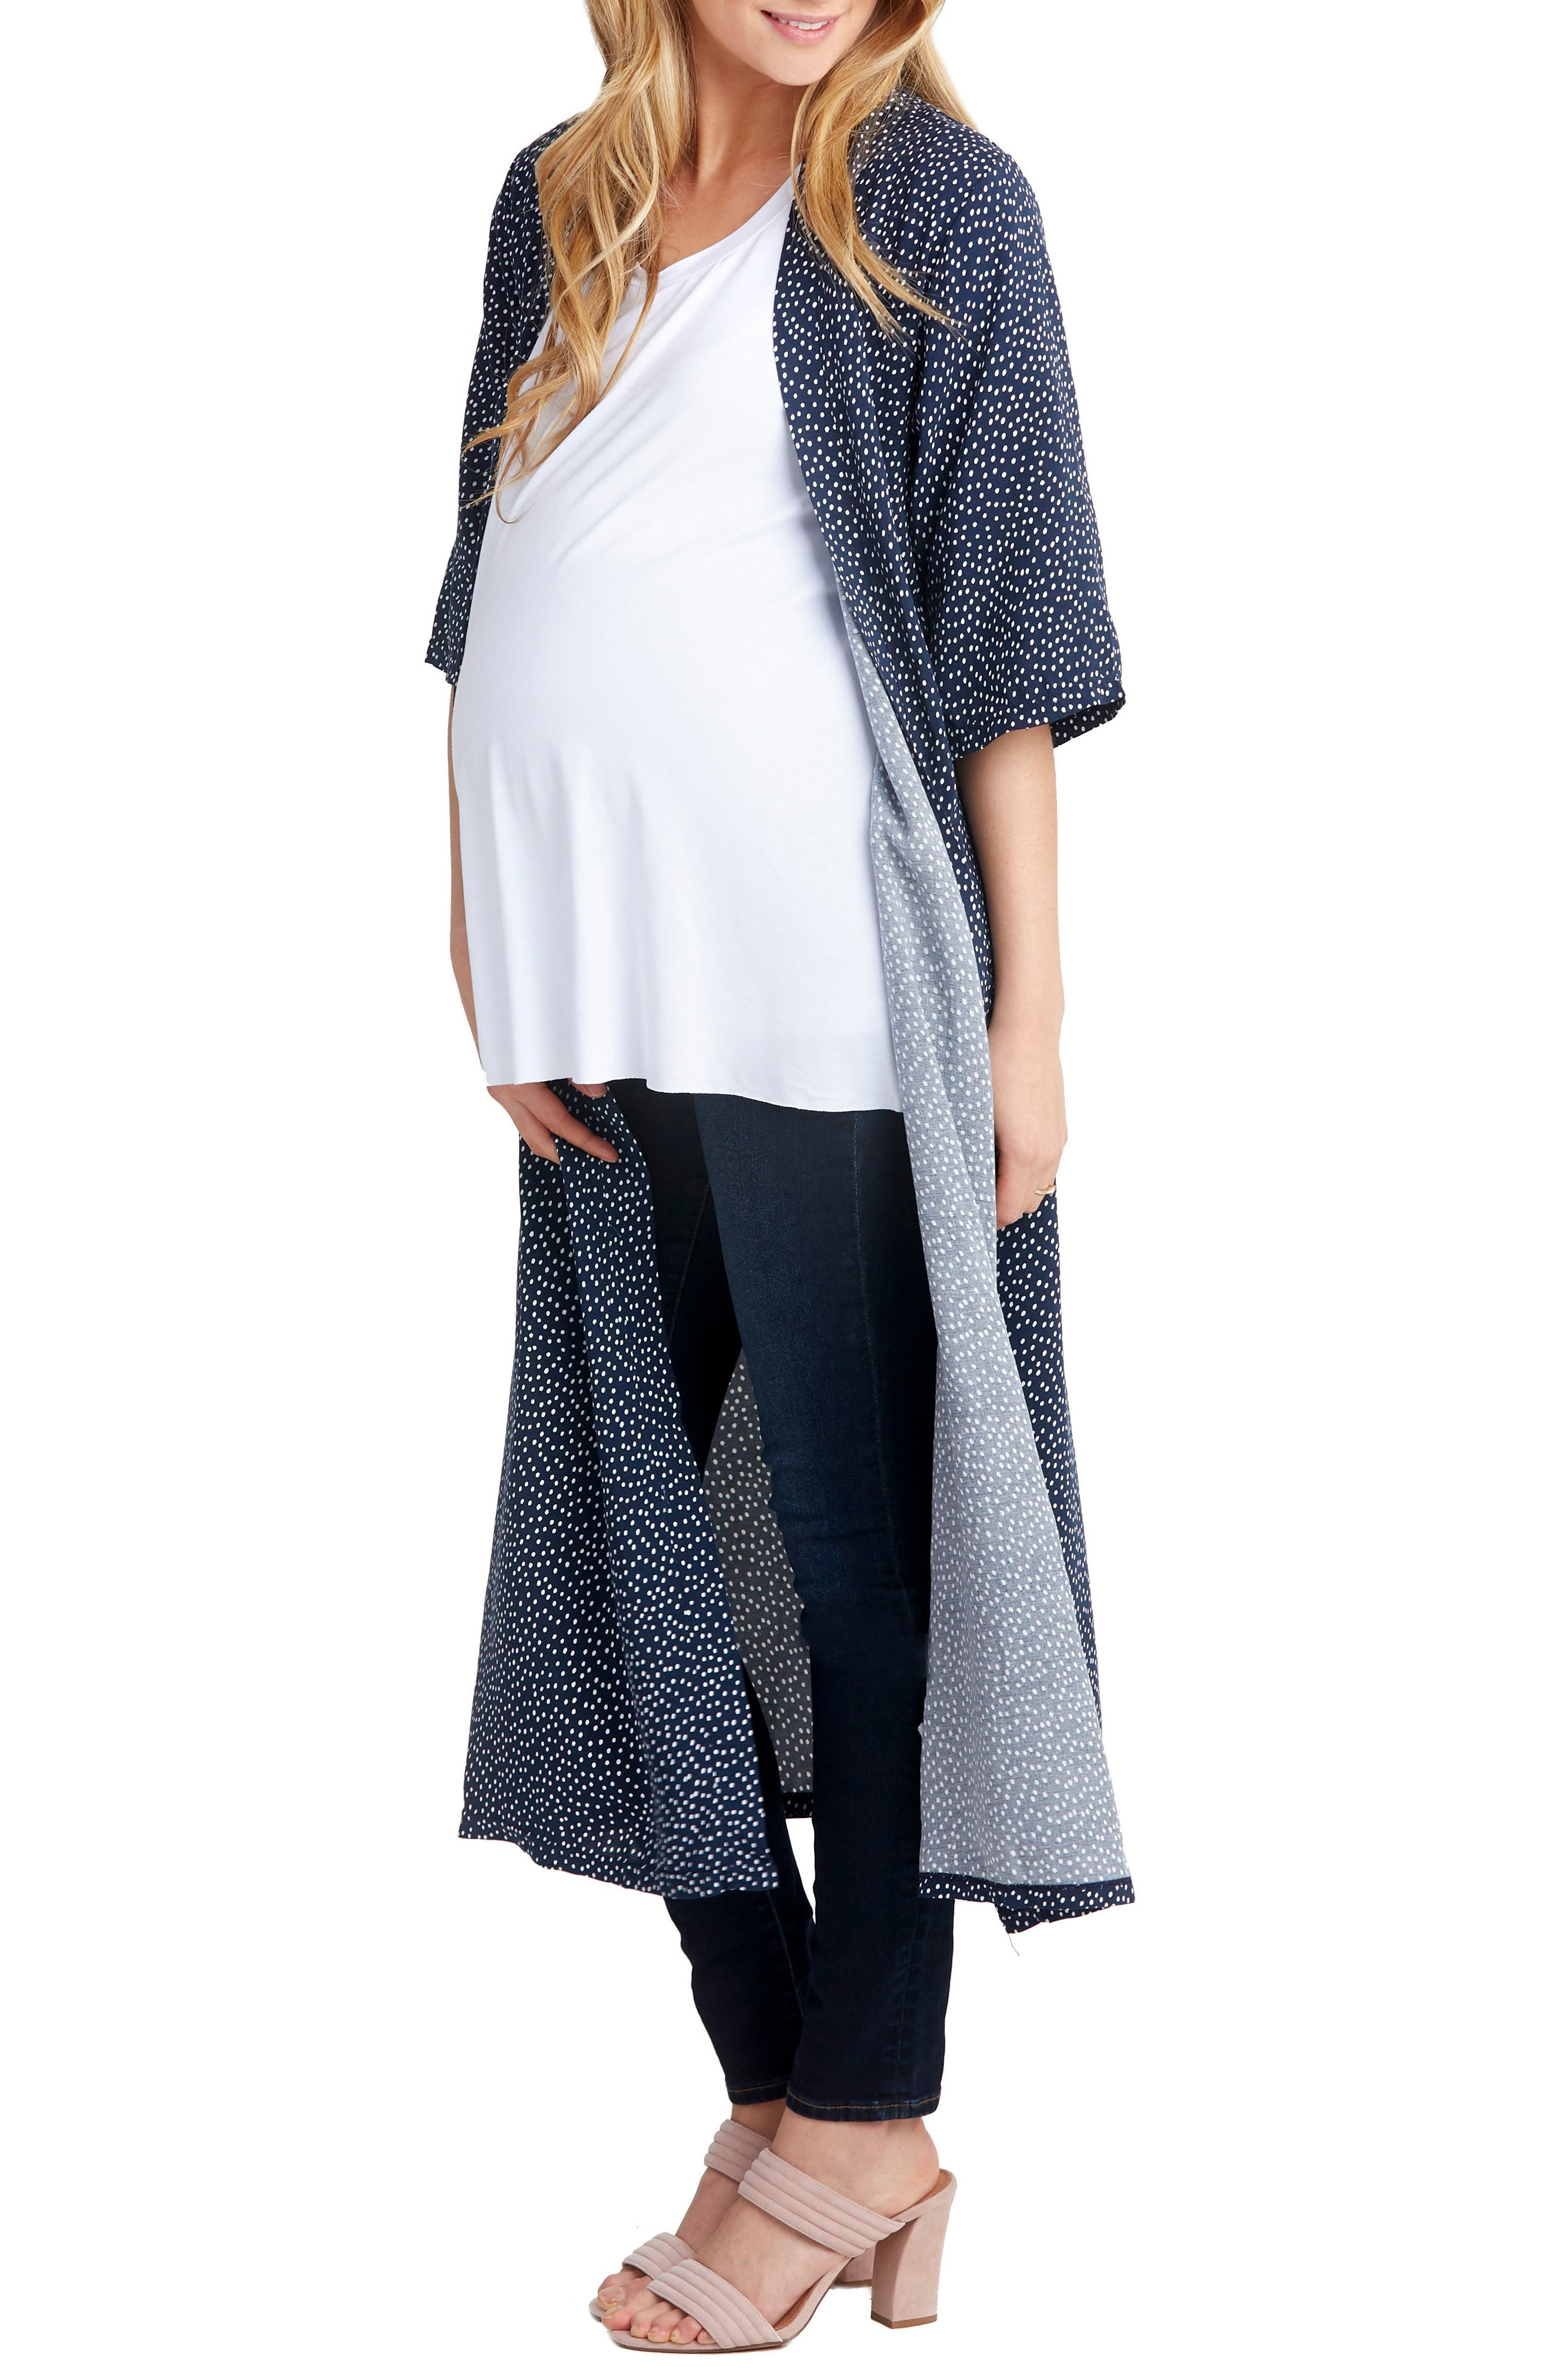 Draper Maternity Robe,                             Alternate thumbnail 3, color,                             Dot